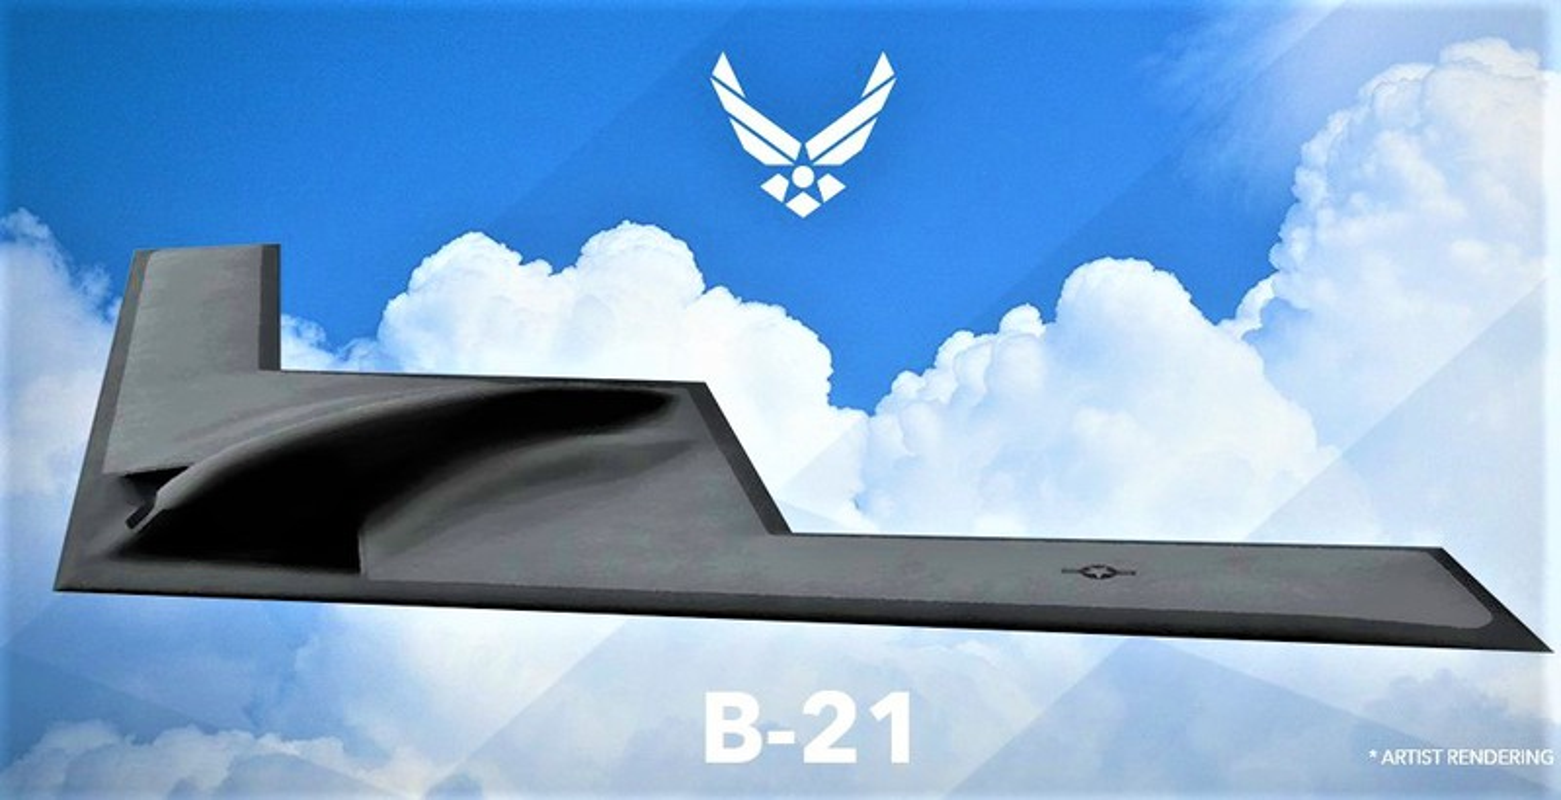 My dung B-21 Raider tang hinh de kiem che Trung Quoc du... chua bay thu